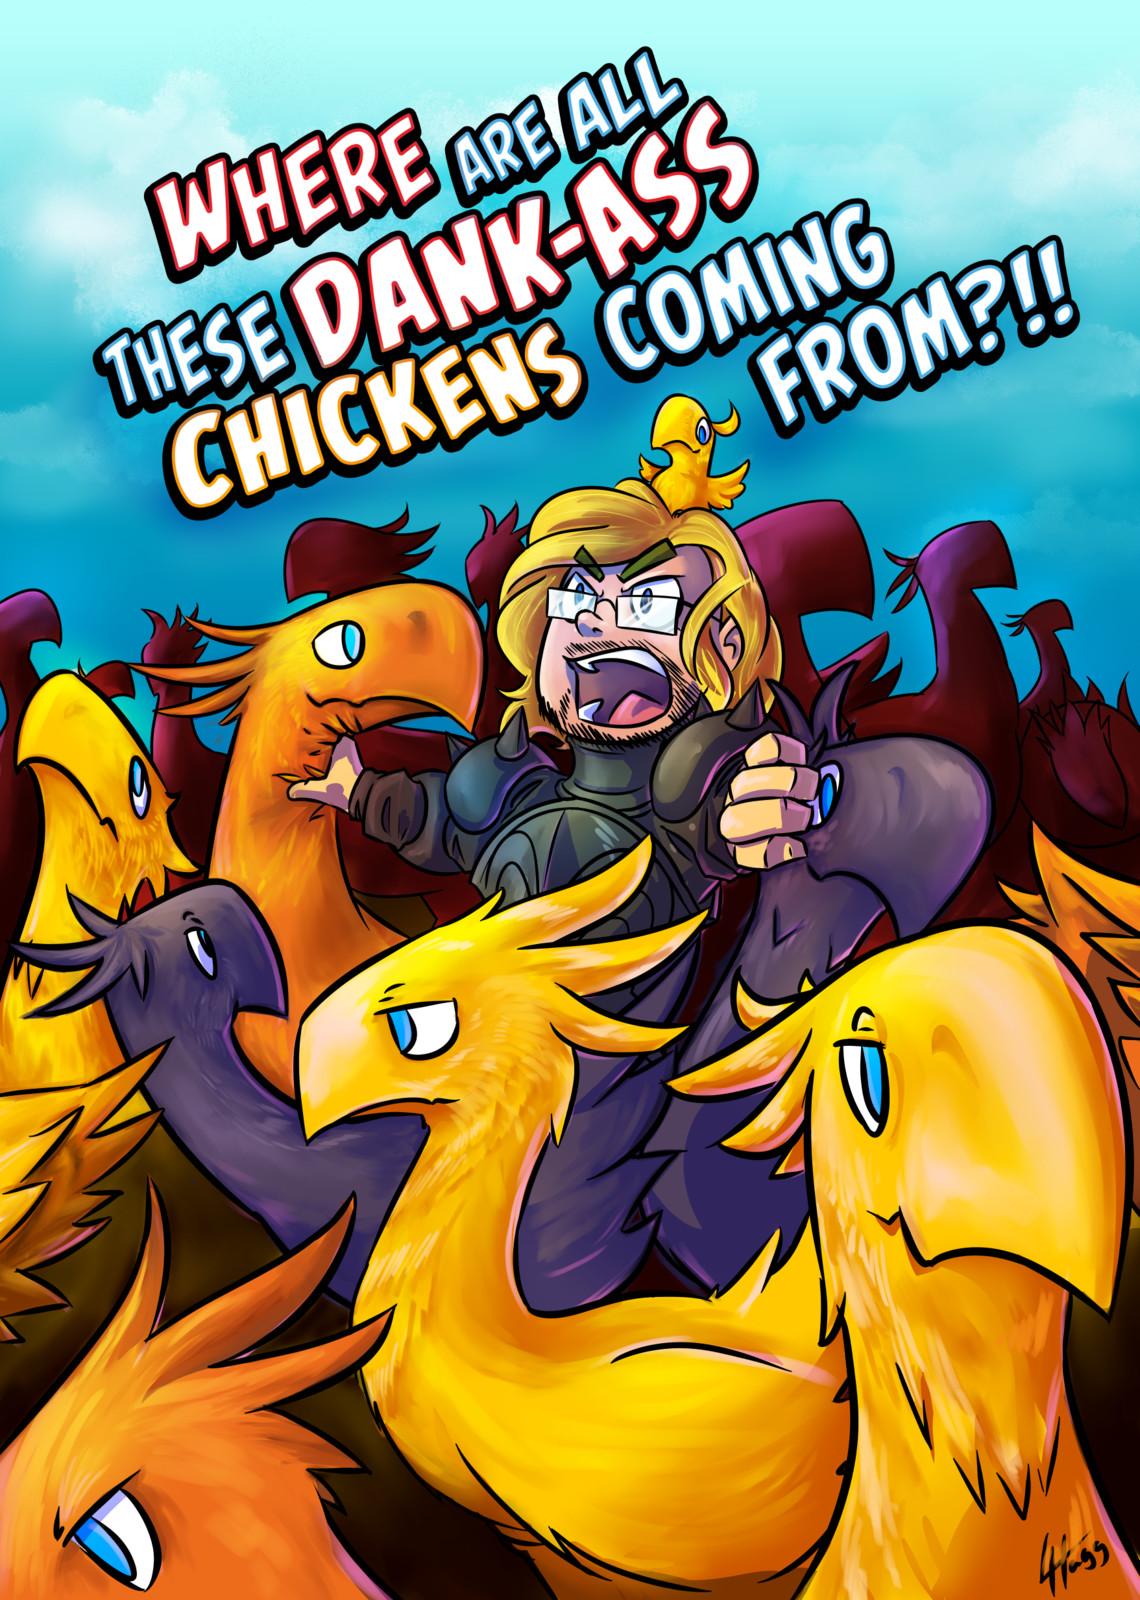 Dank Chickens